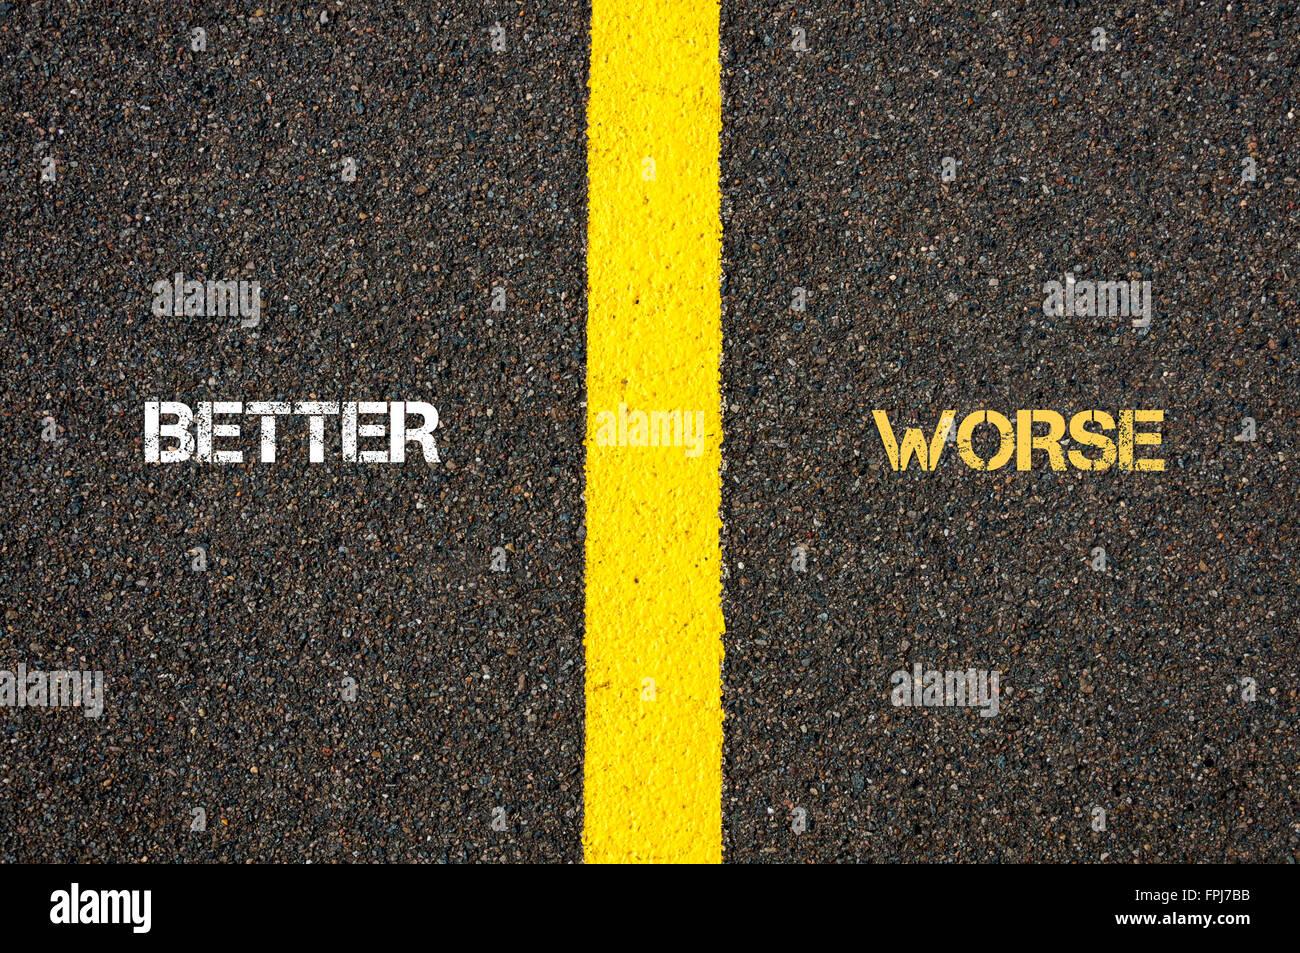 Antonym concept of BETTER versus WORSE written over tarmac, road marking yellow paint separating line between words Stock Photo